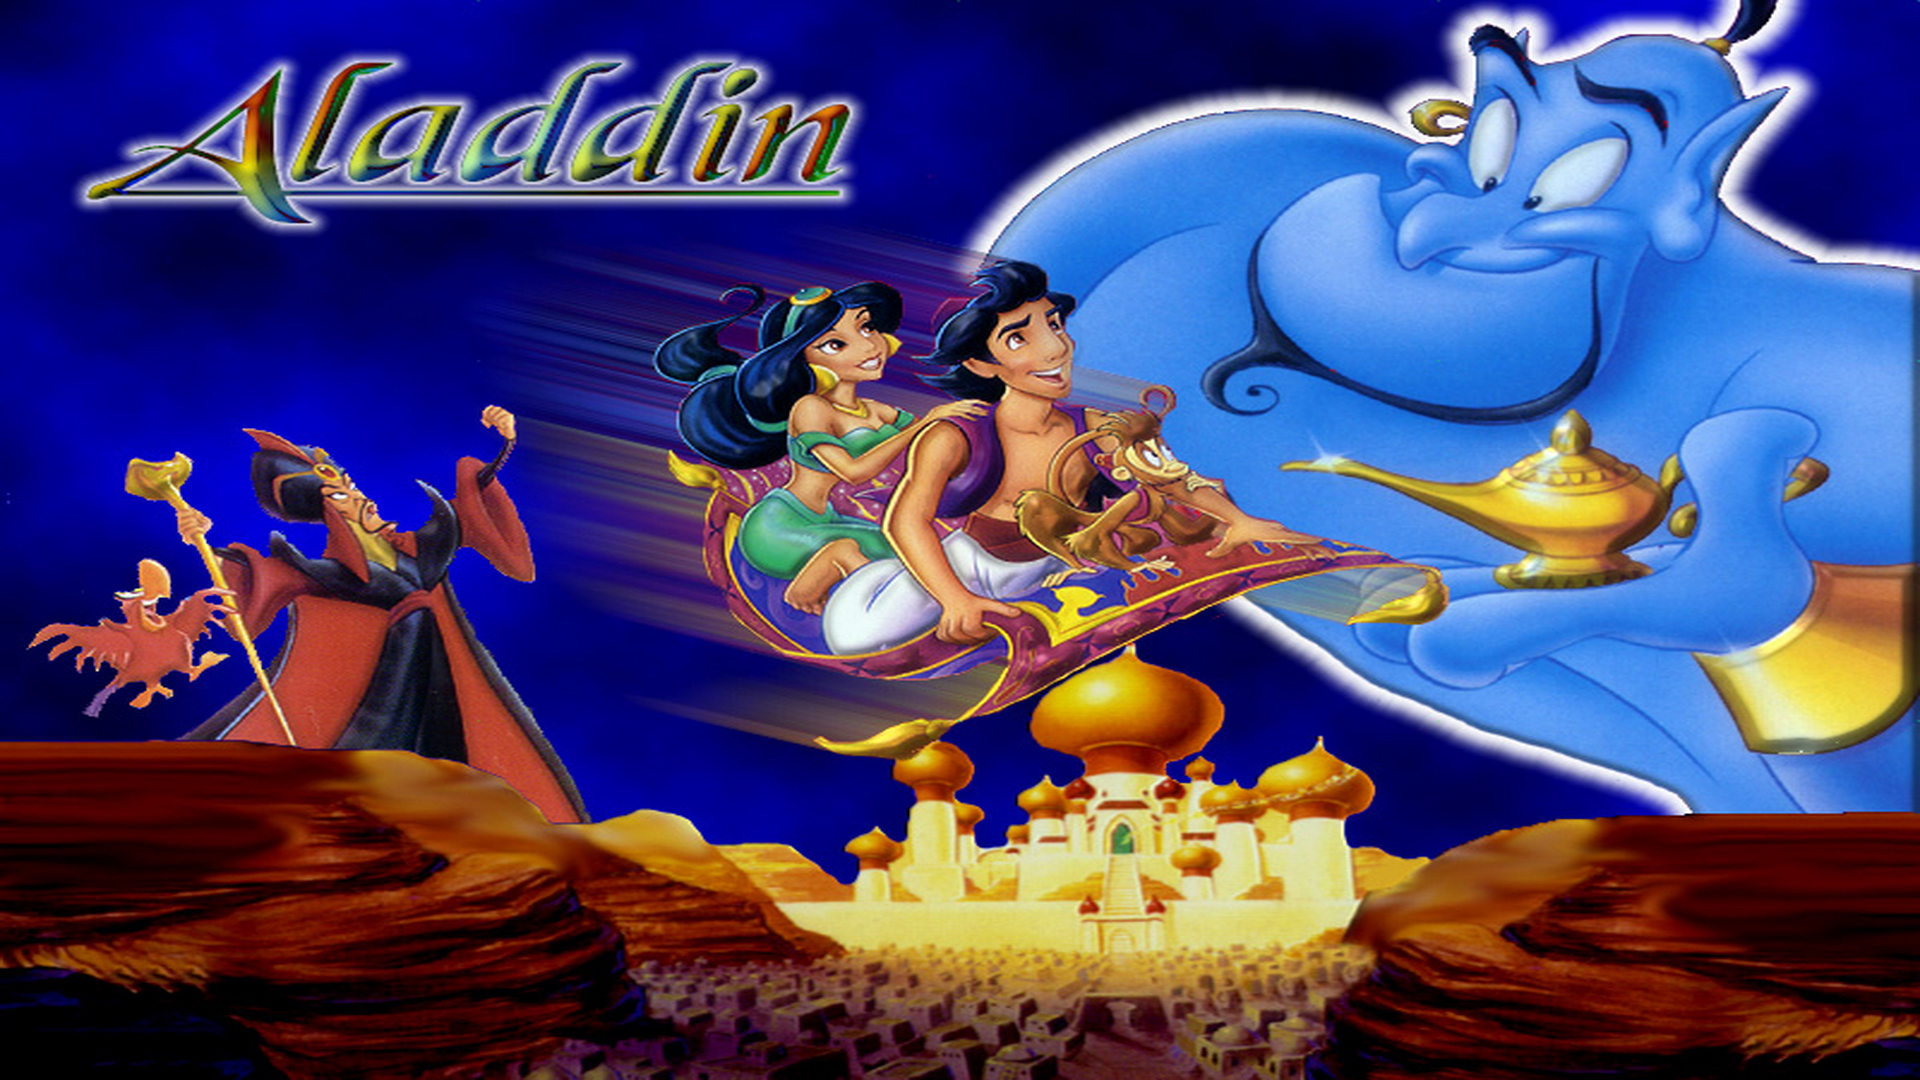 Aladdin Wallpaper HD - WallpaperSafari